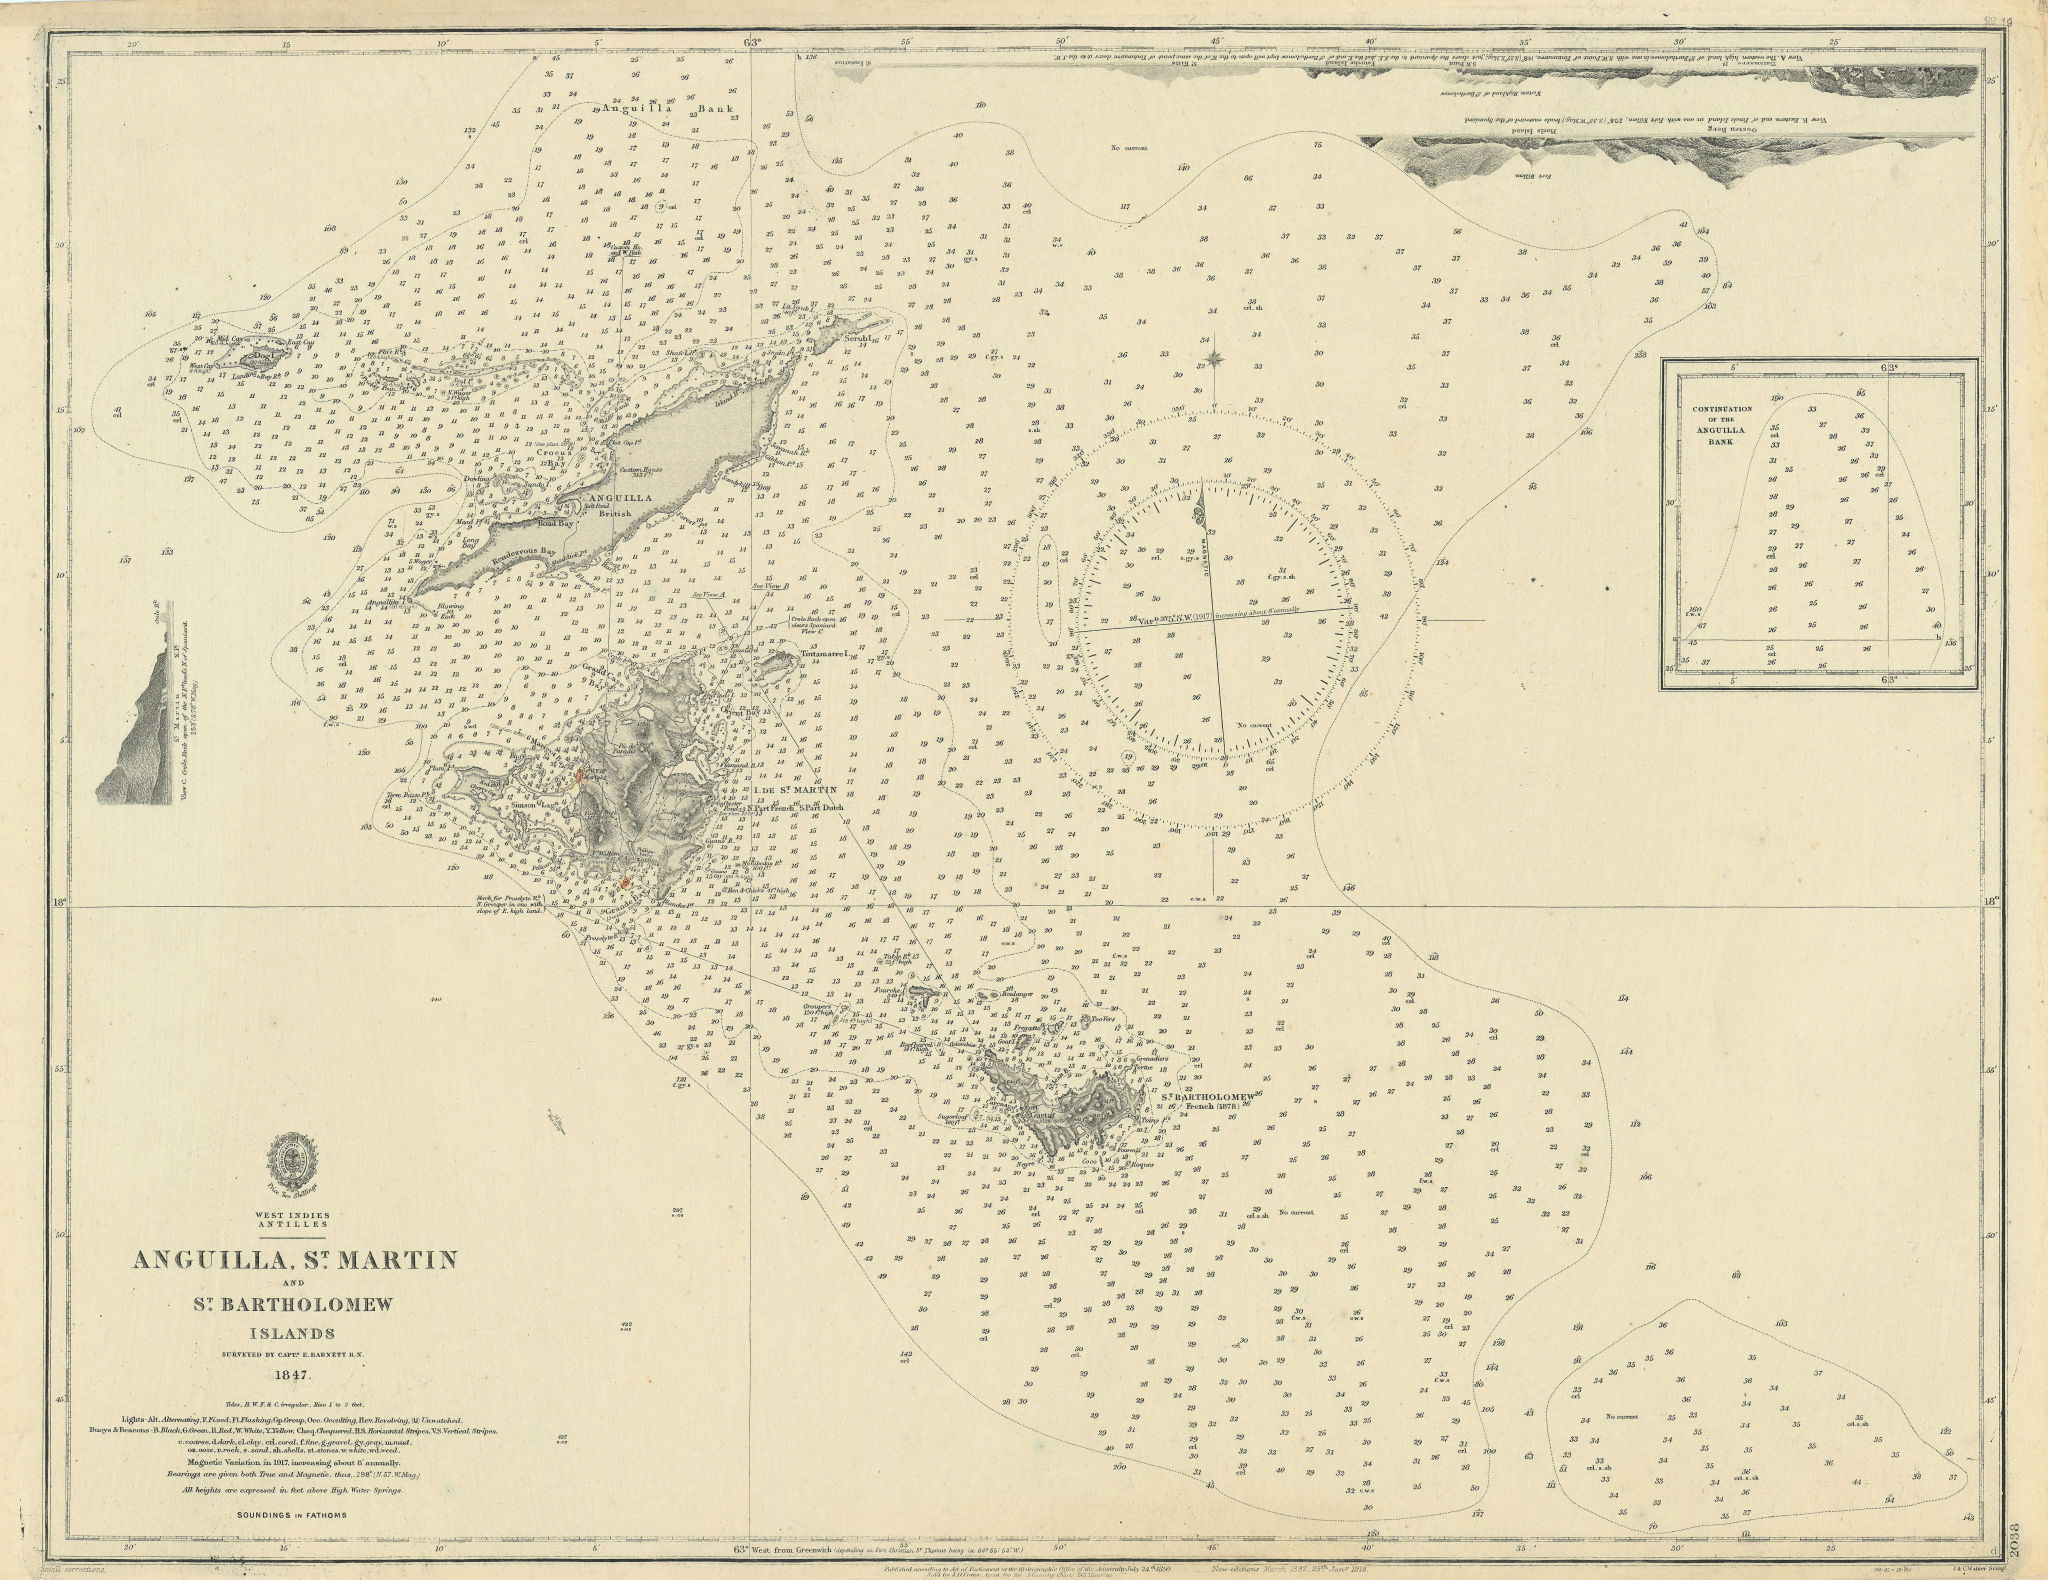 Antilles Anguilla St Martin Bartholomew Islands ADMIRALTY chart 1850 (1918) map